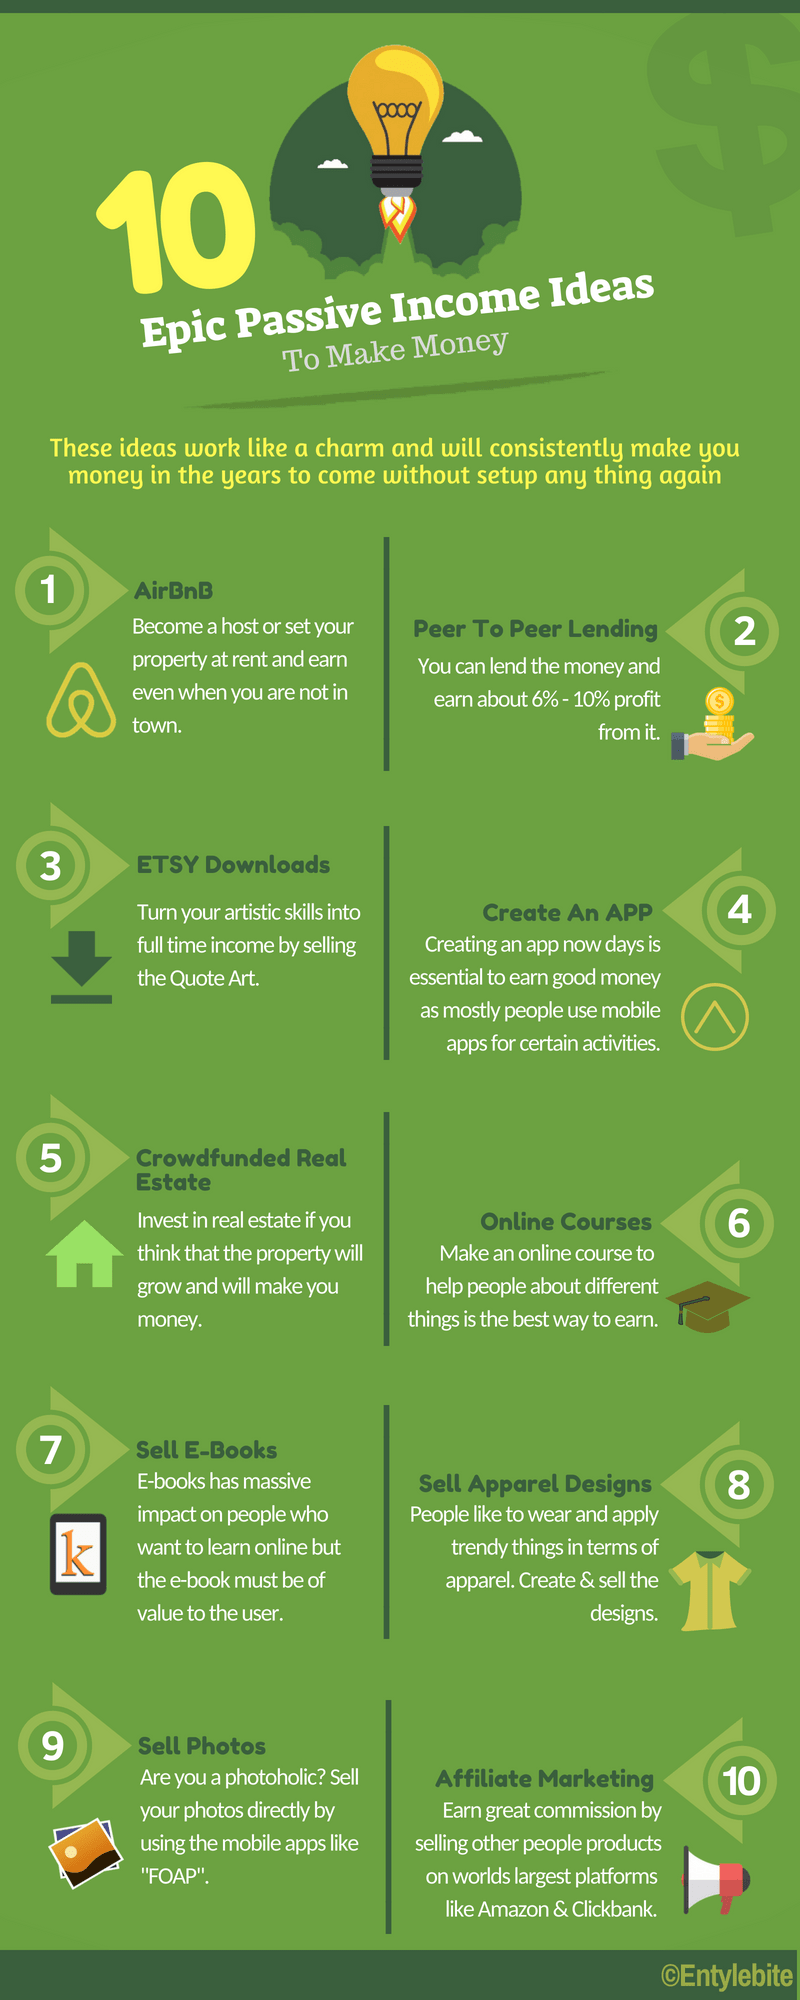 How To Do Online Work Eve Online Best Way To Earn Money